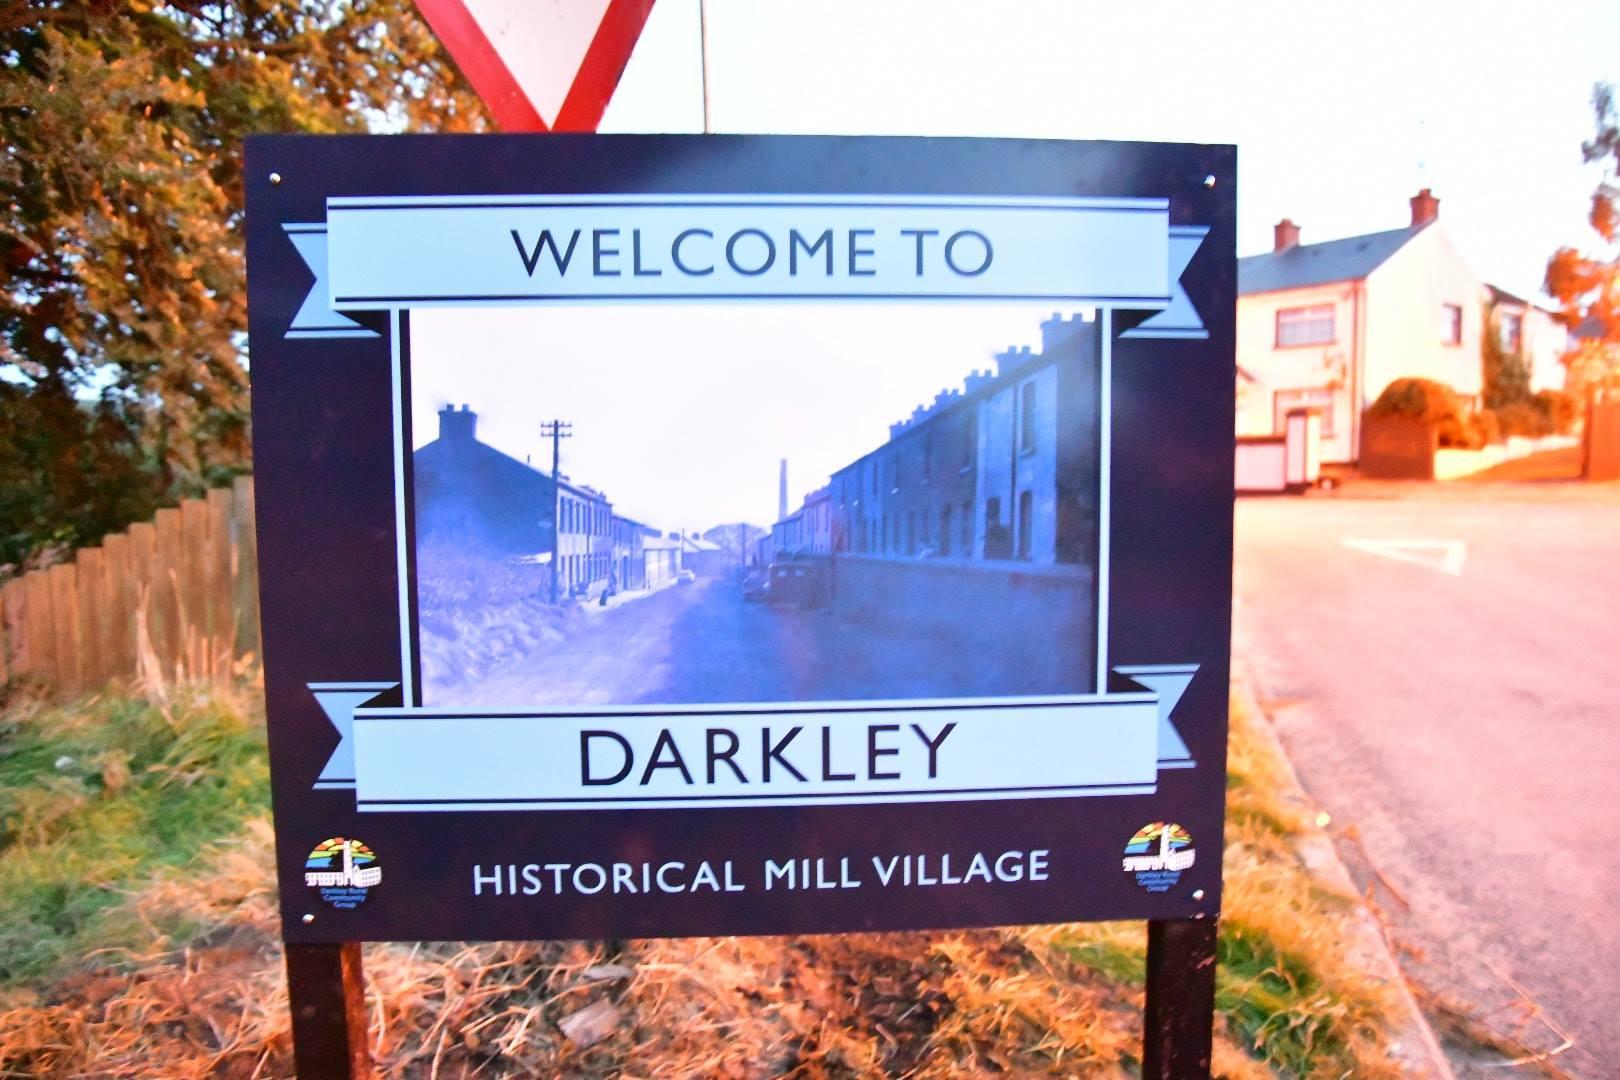 Darkley